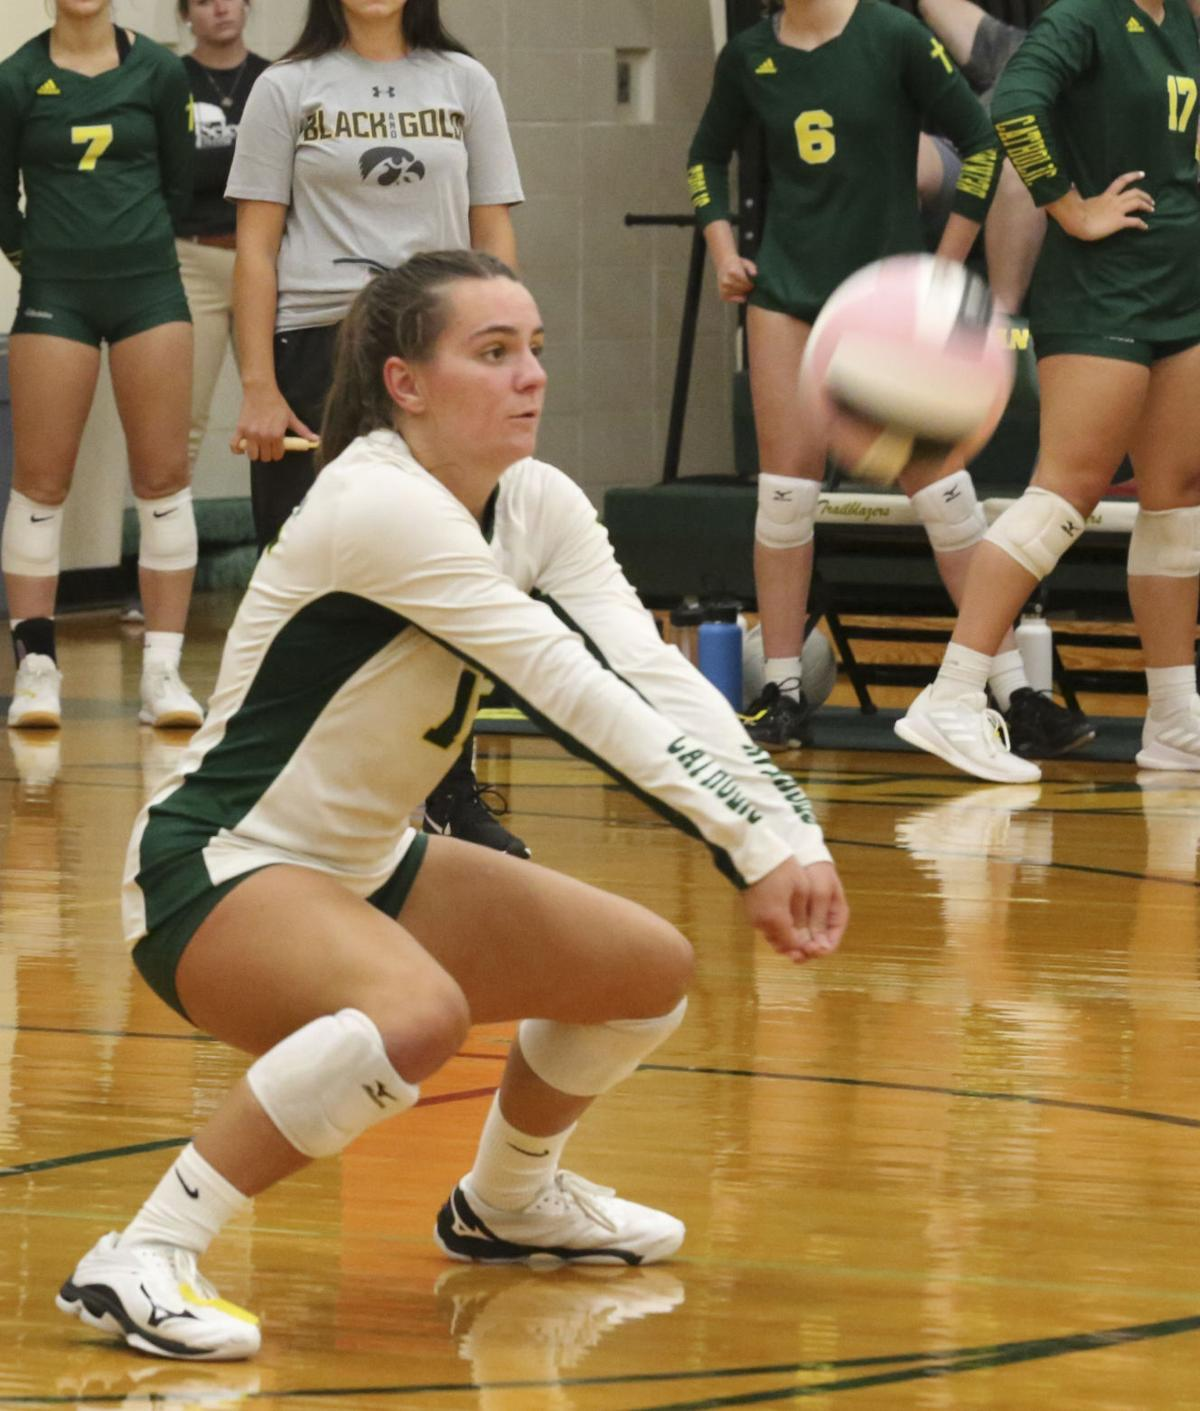 Olivia Hogan has her eye on the ball while returning serve.